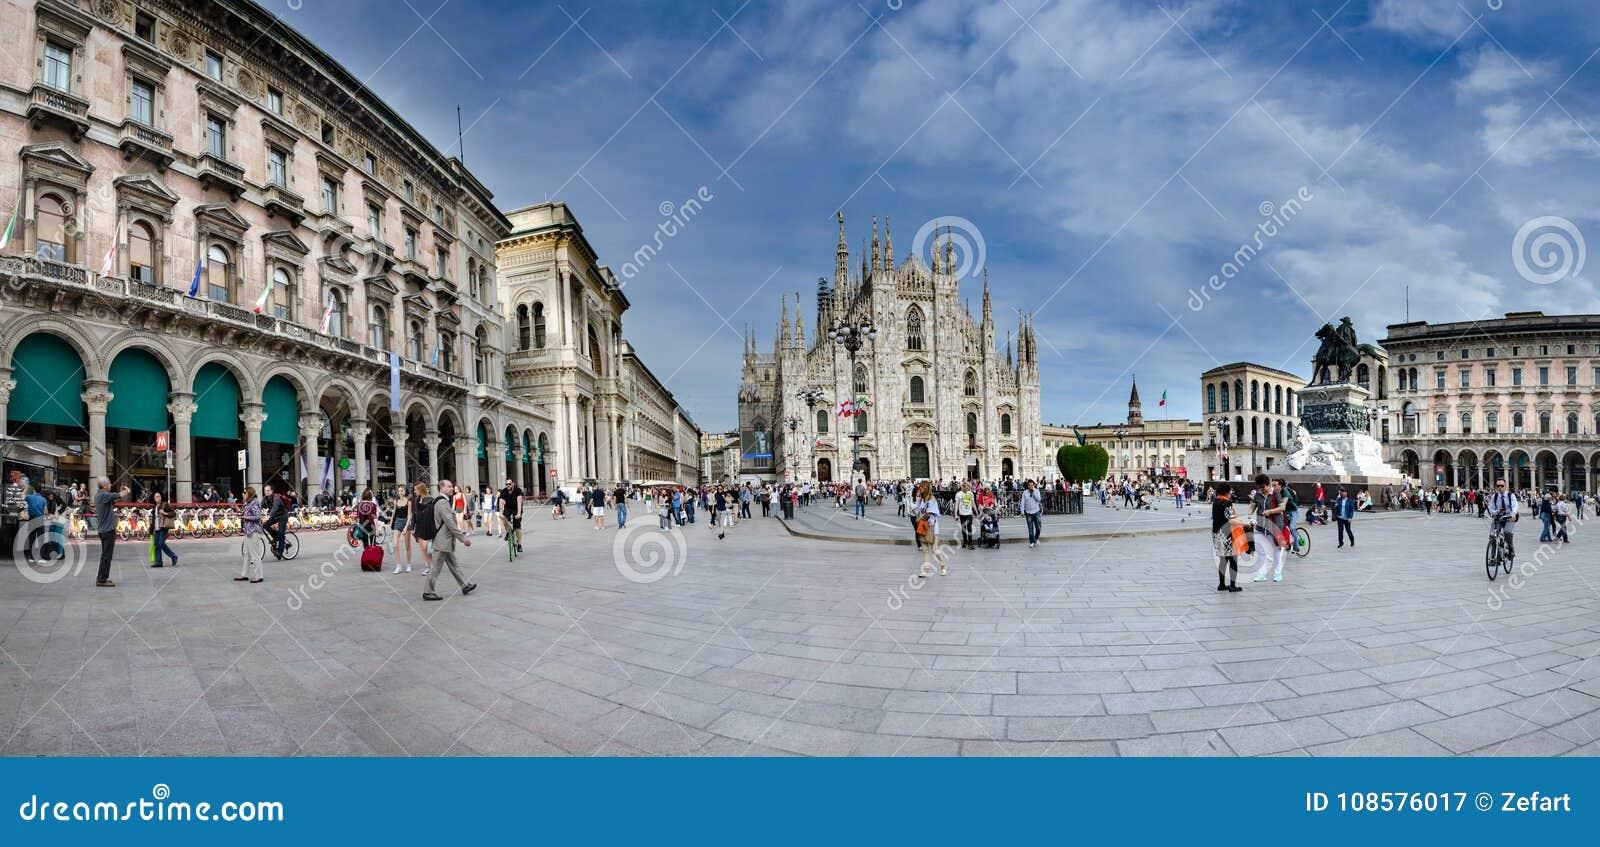 Panorama van Kathedraal en Piazza del Duomo in Milaan, Italië